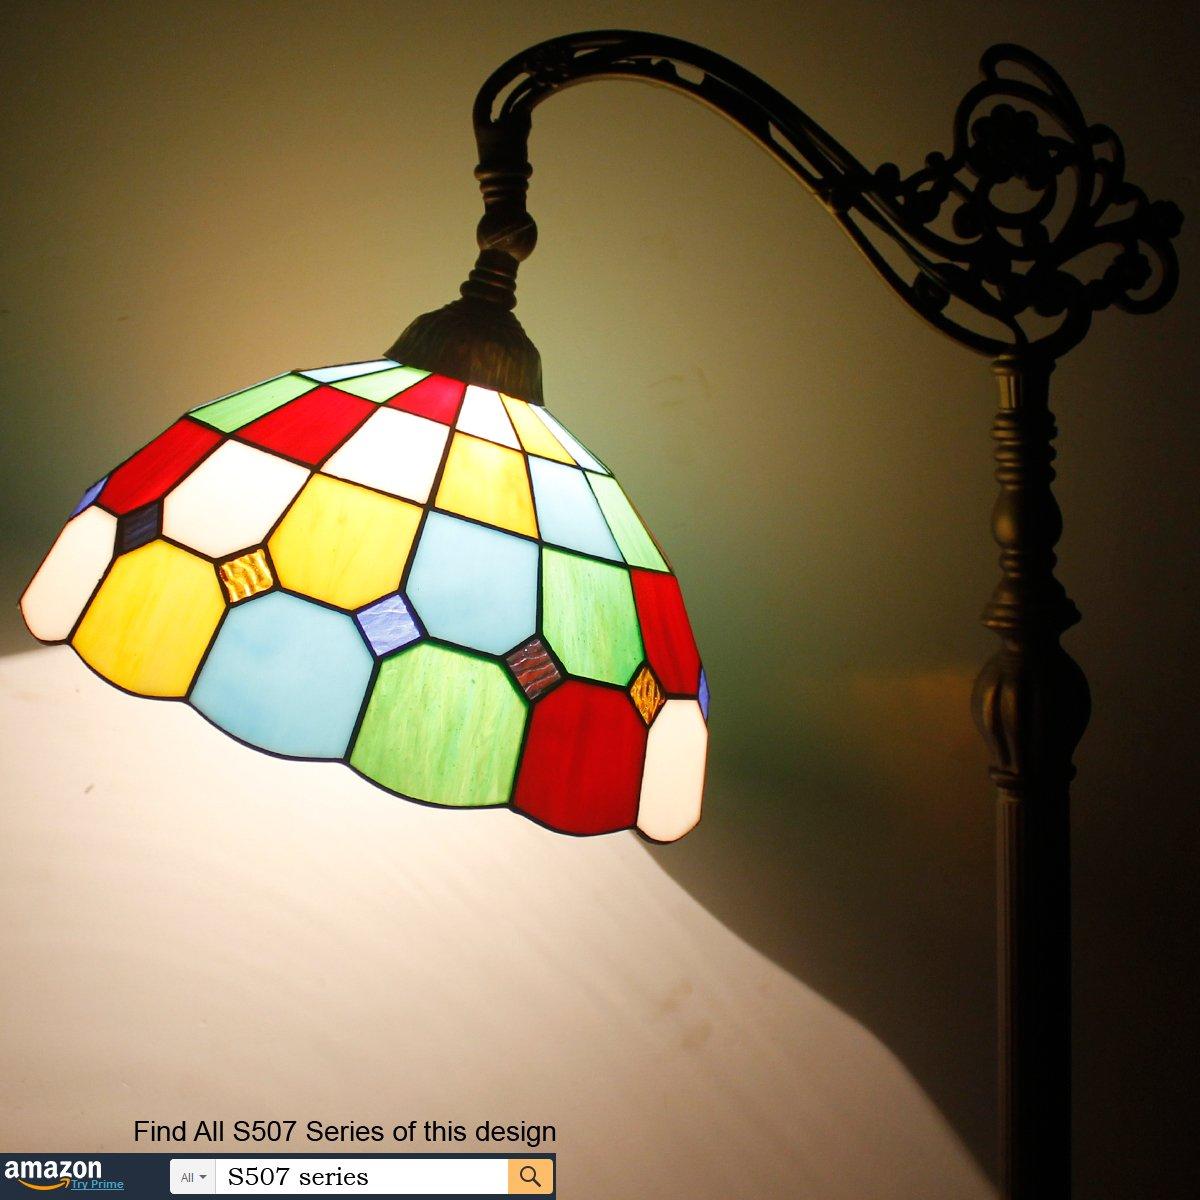 Tiffany Style Reading Floor Lamp Table Desk Lighting Tartan Design W12H64 E26 by werfactory (Image #2)